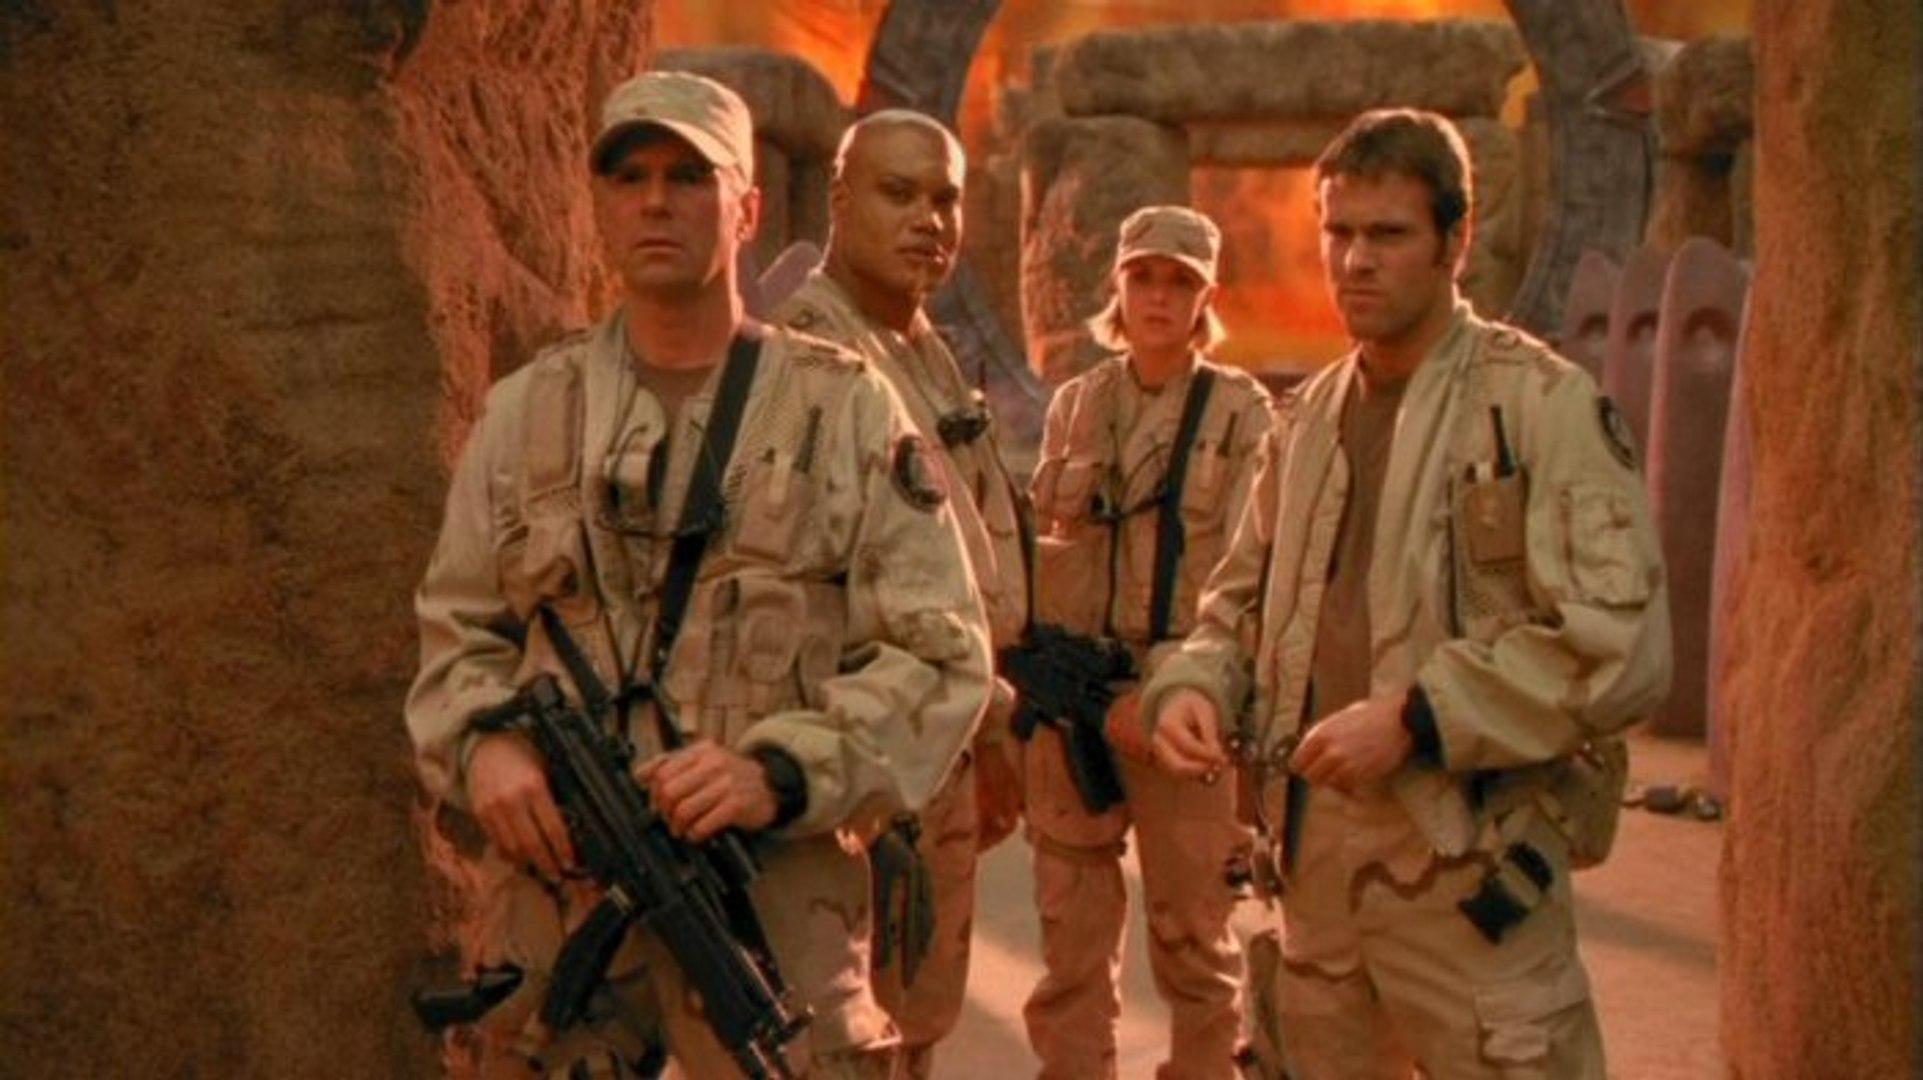 Stargate SG-1 - S 5 E 12 - Wormhole X-Treme!